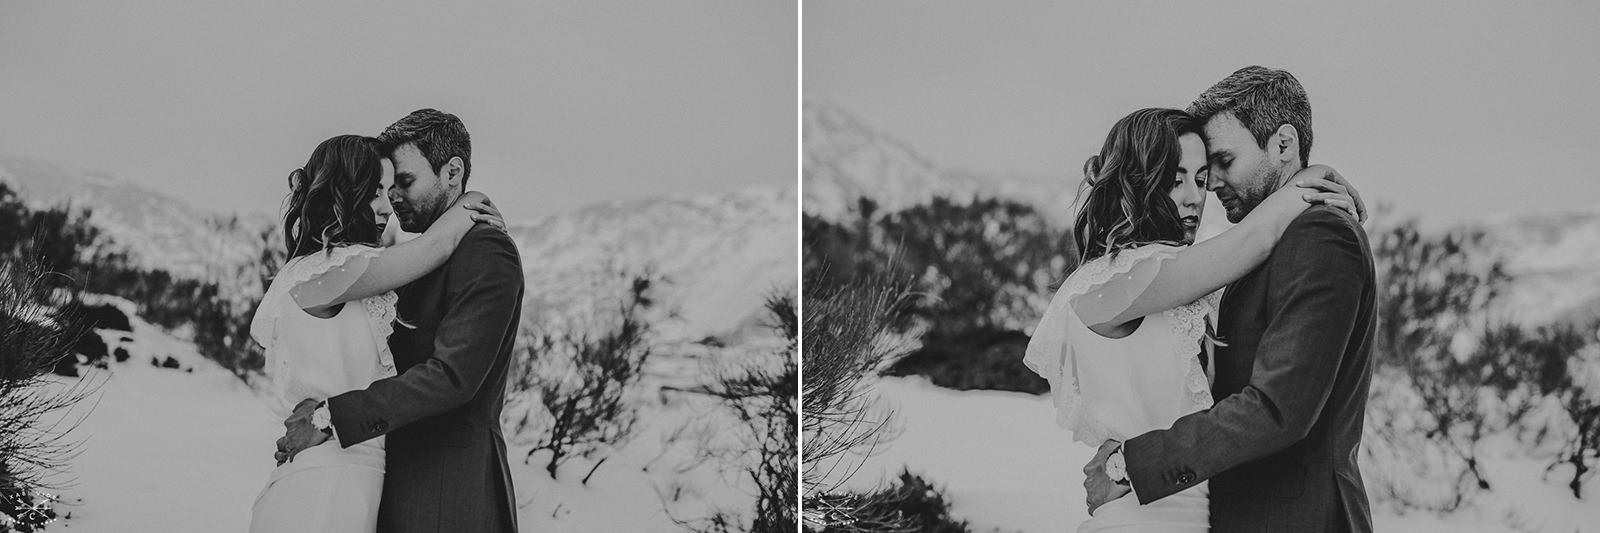 fotógrafo de bodas en bilbao-13